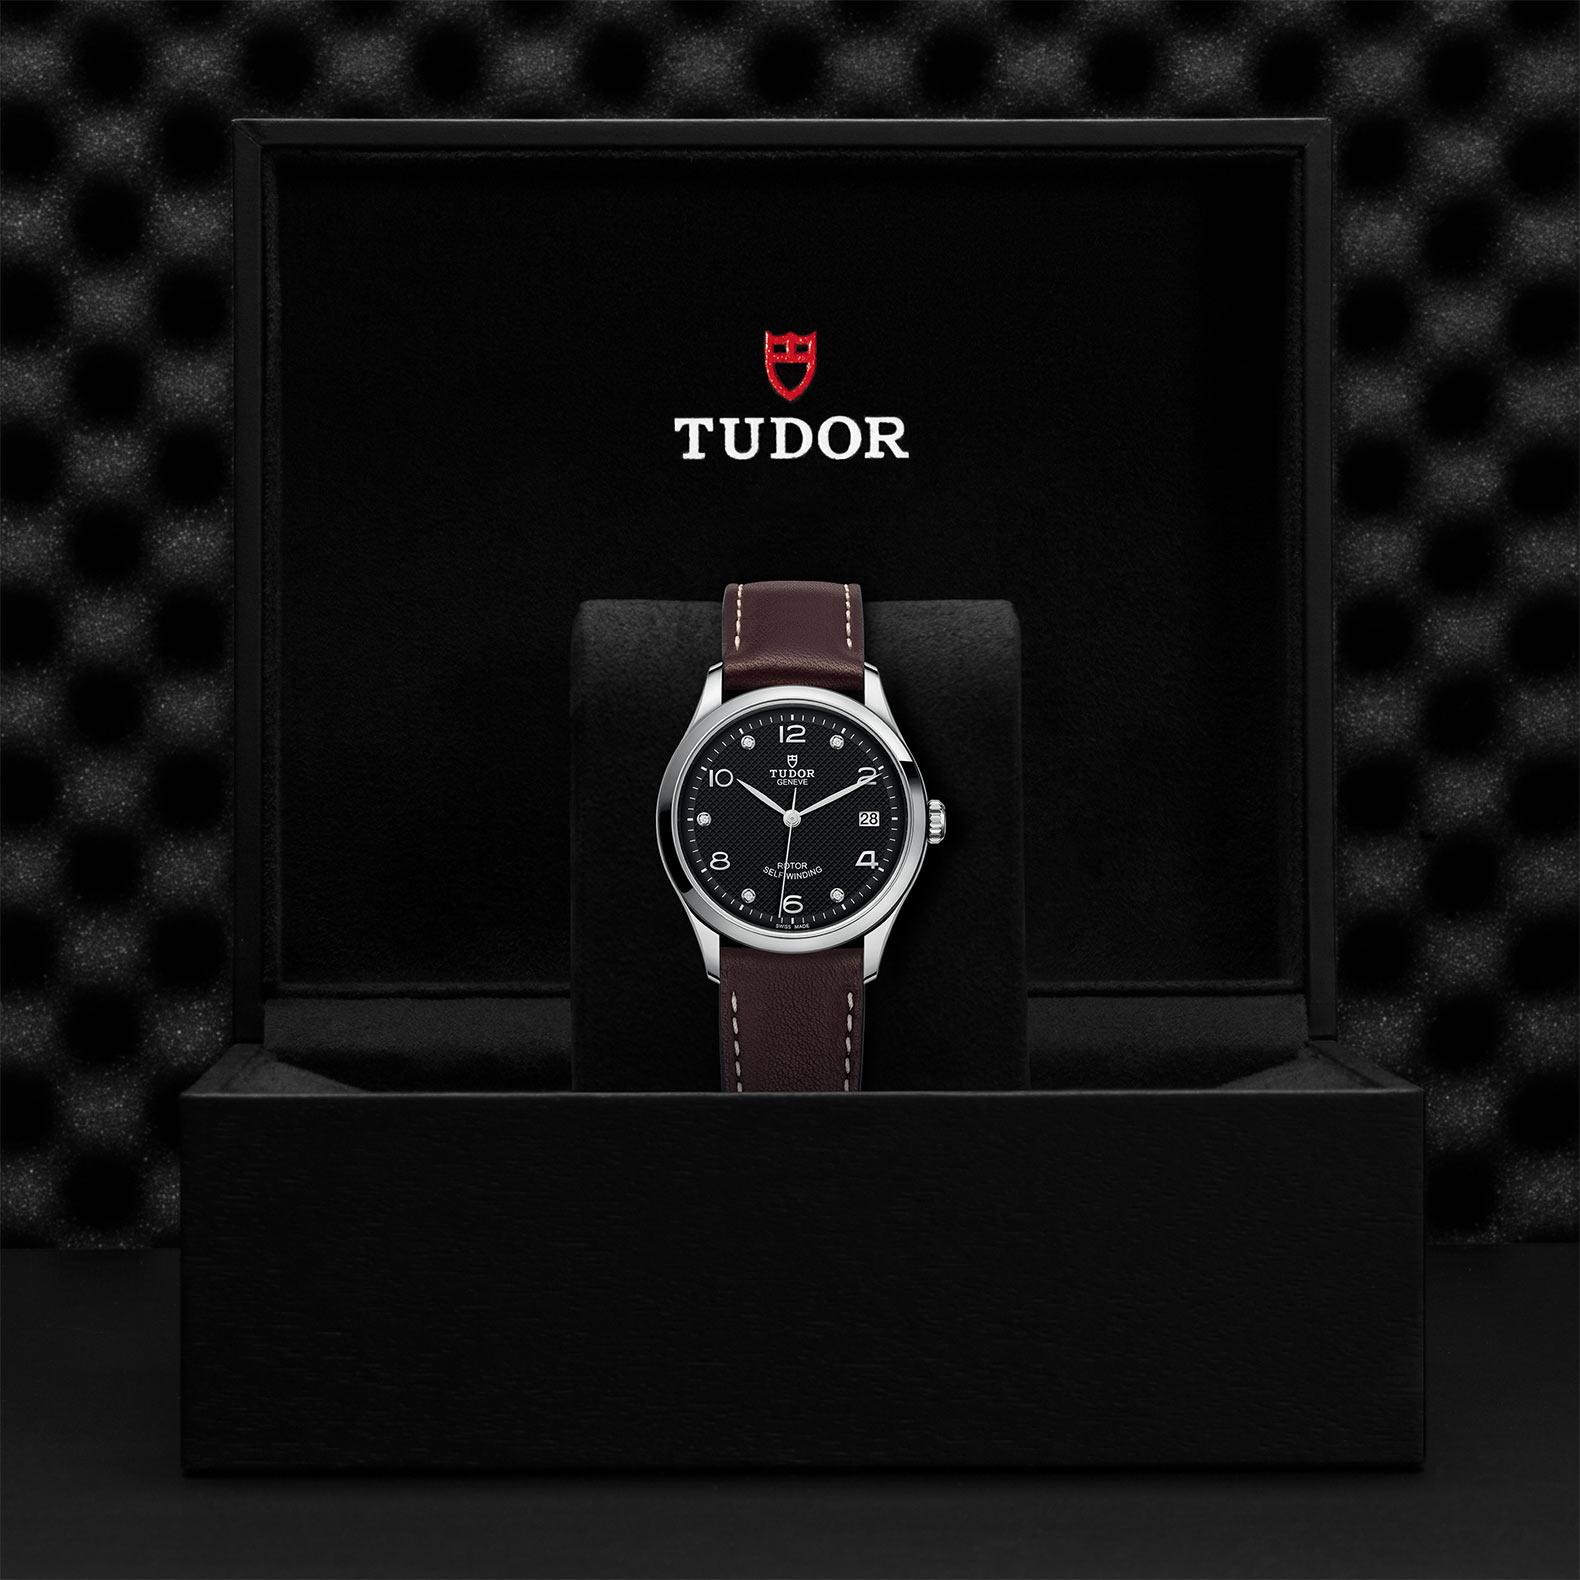 TUDOR 1926 - M91450-0009